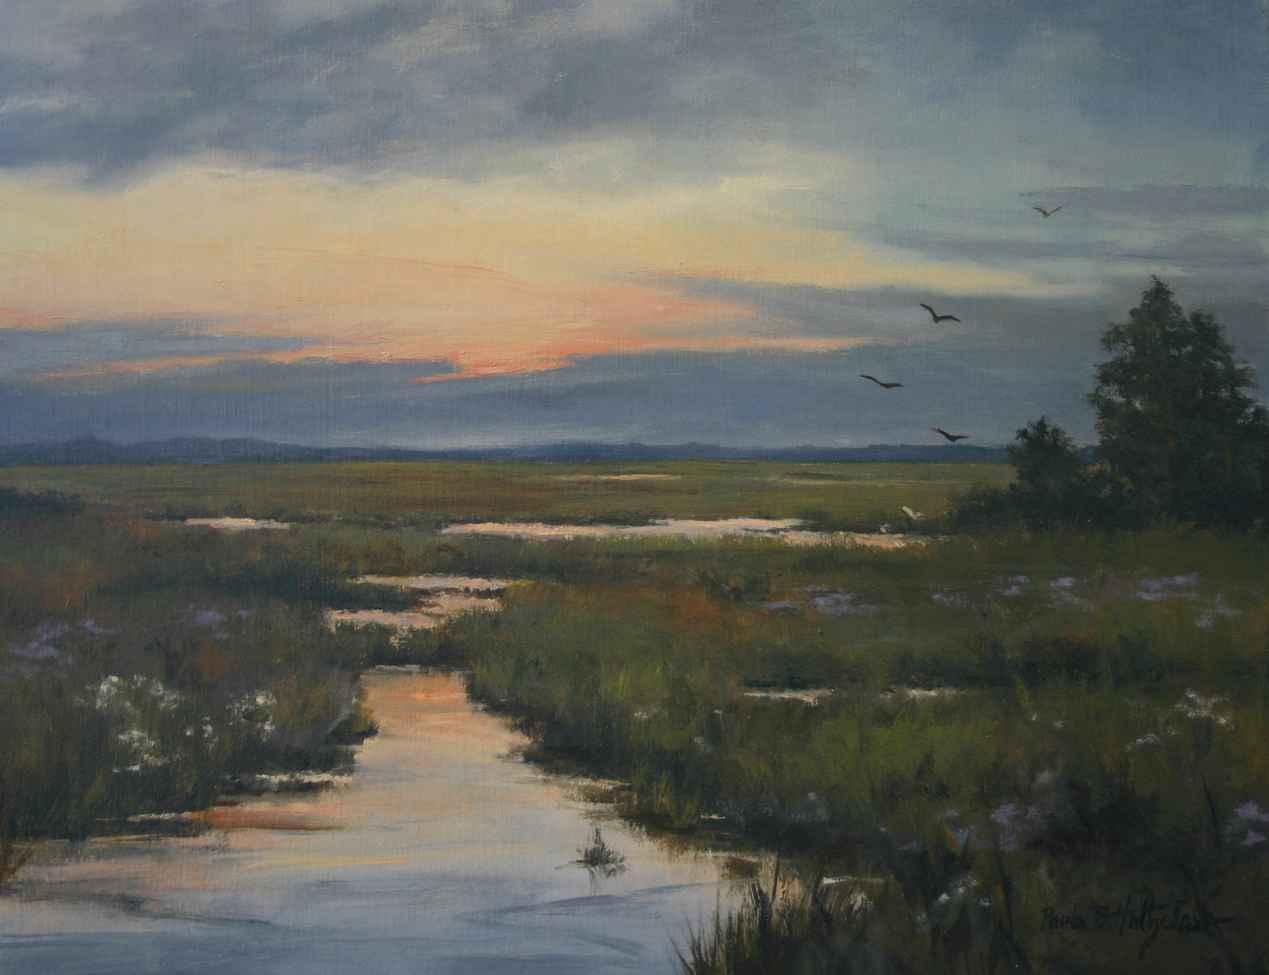 Evening Serenade by  Paula Holtzclaw - Masterpiece Online